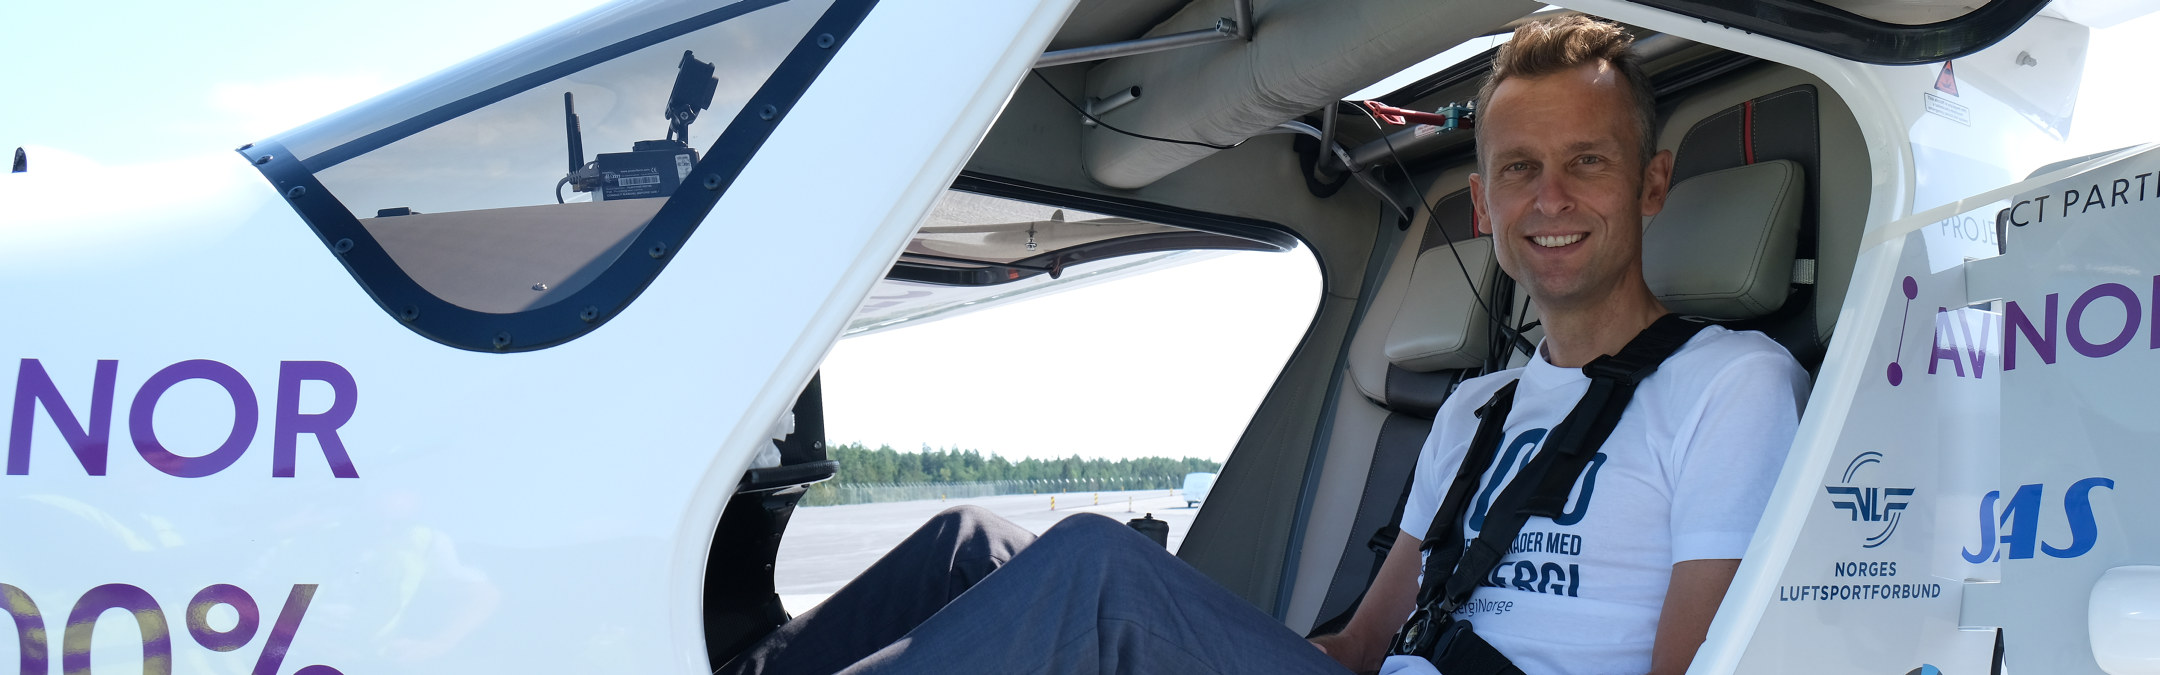 Foto: En mann sitter i et flysete og smiler.